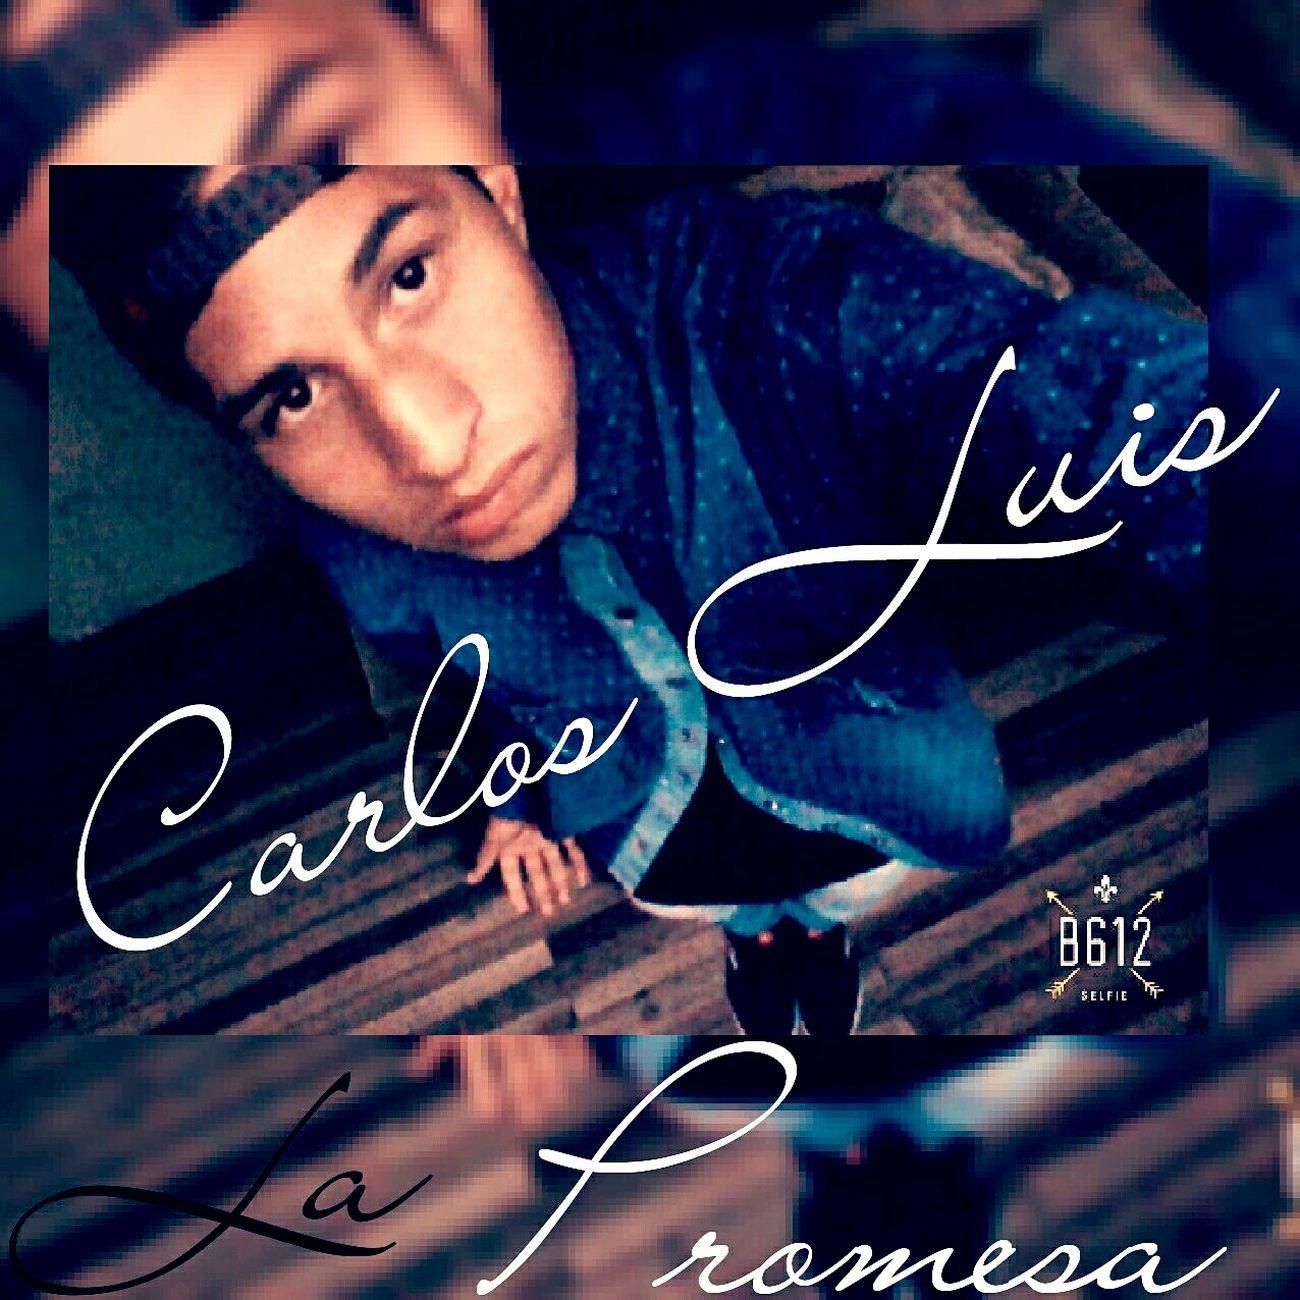 Carlos Luis Lapromesa CarlosLuis 😘👍☝🎤🎤🎧